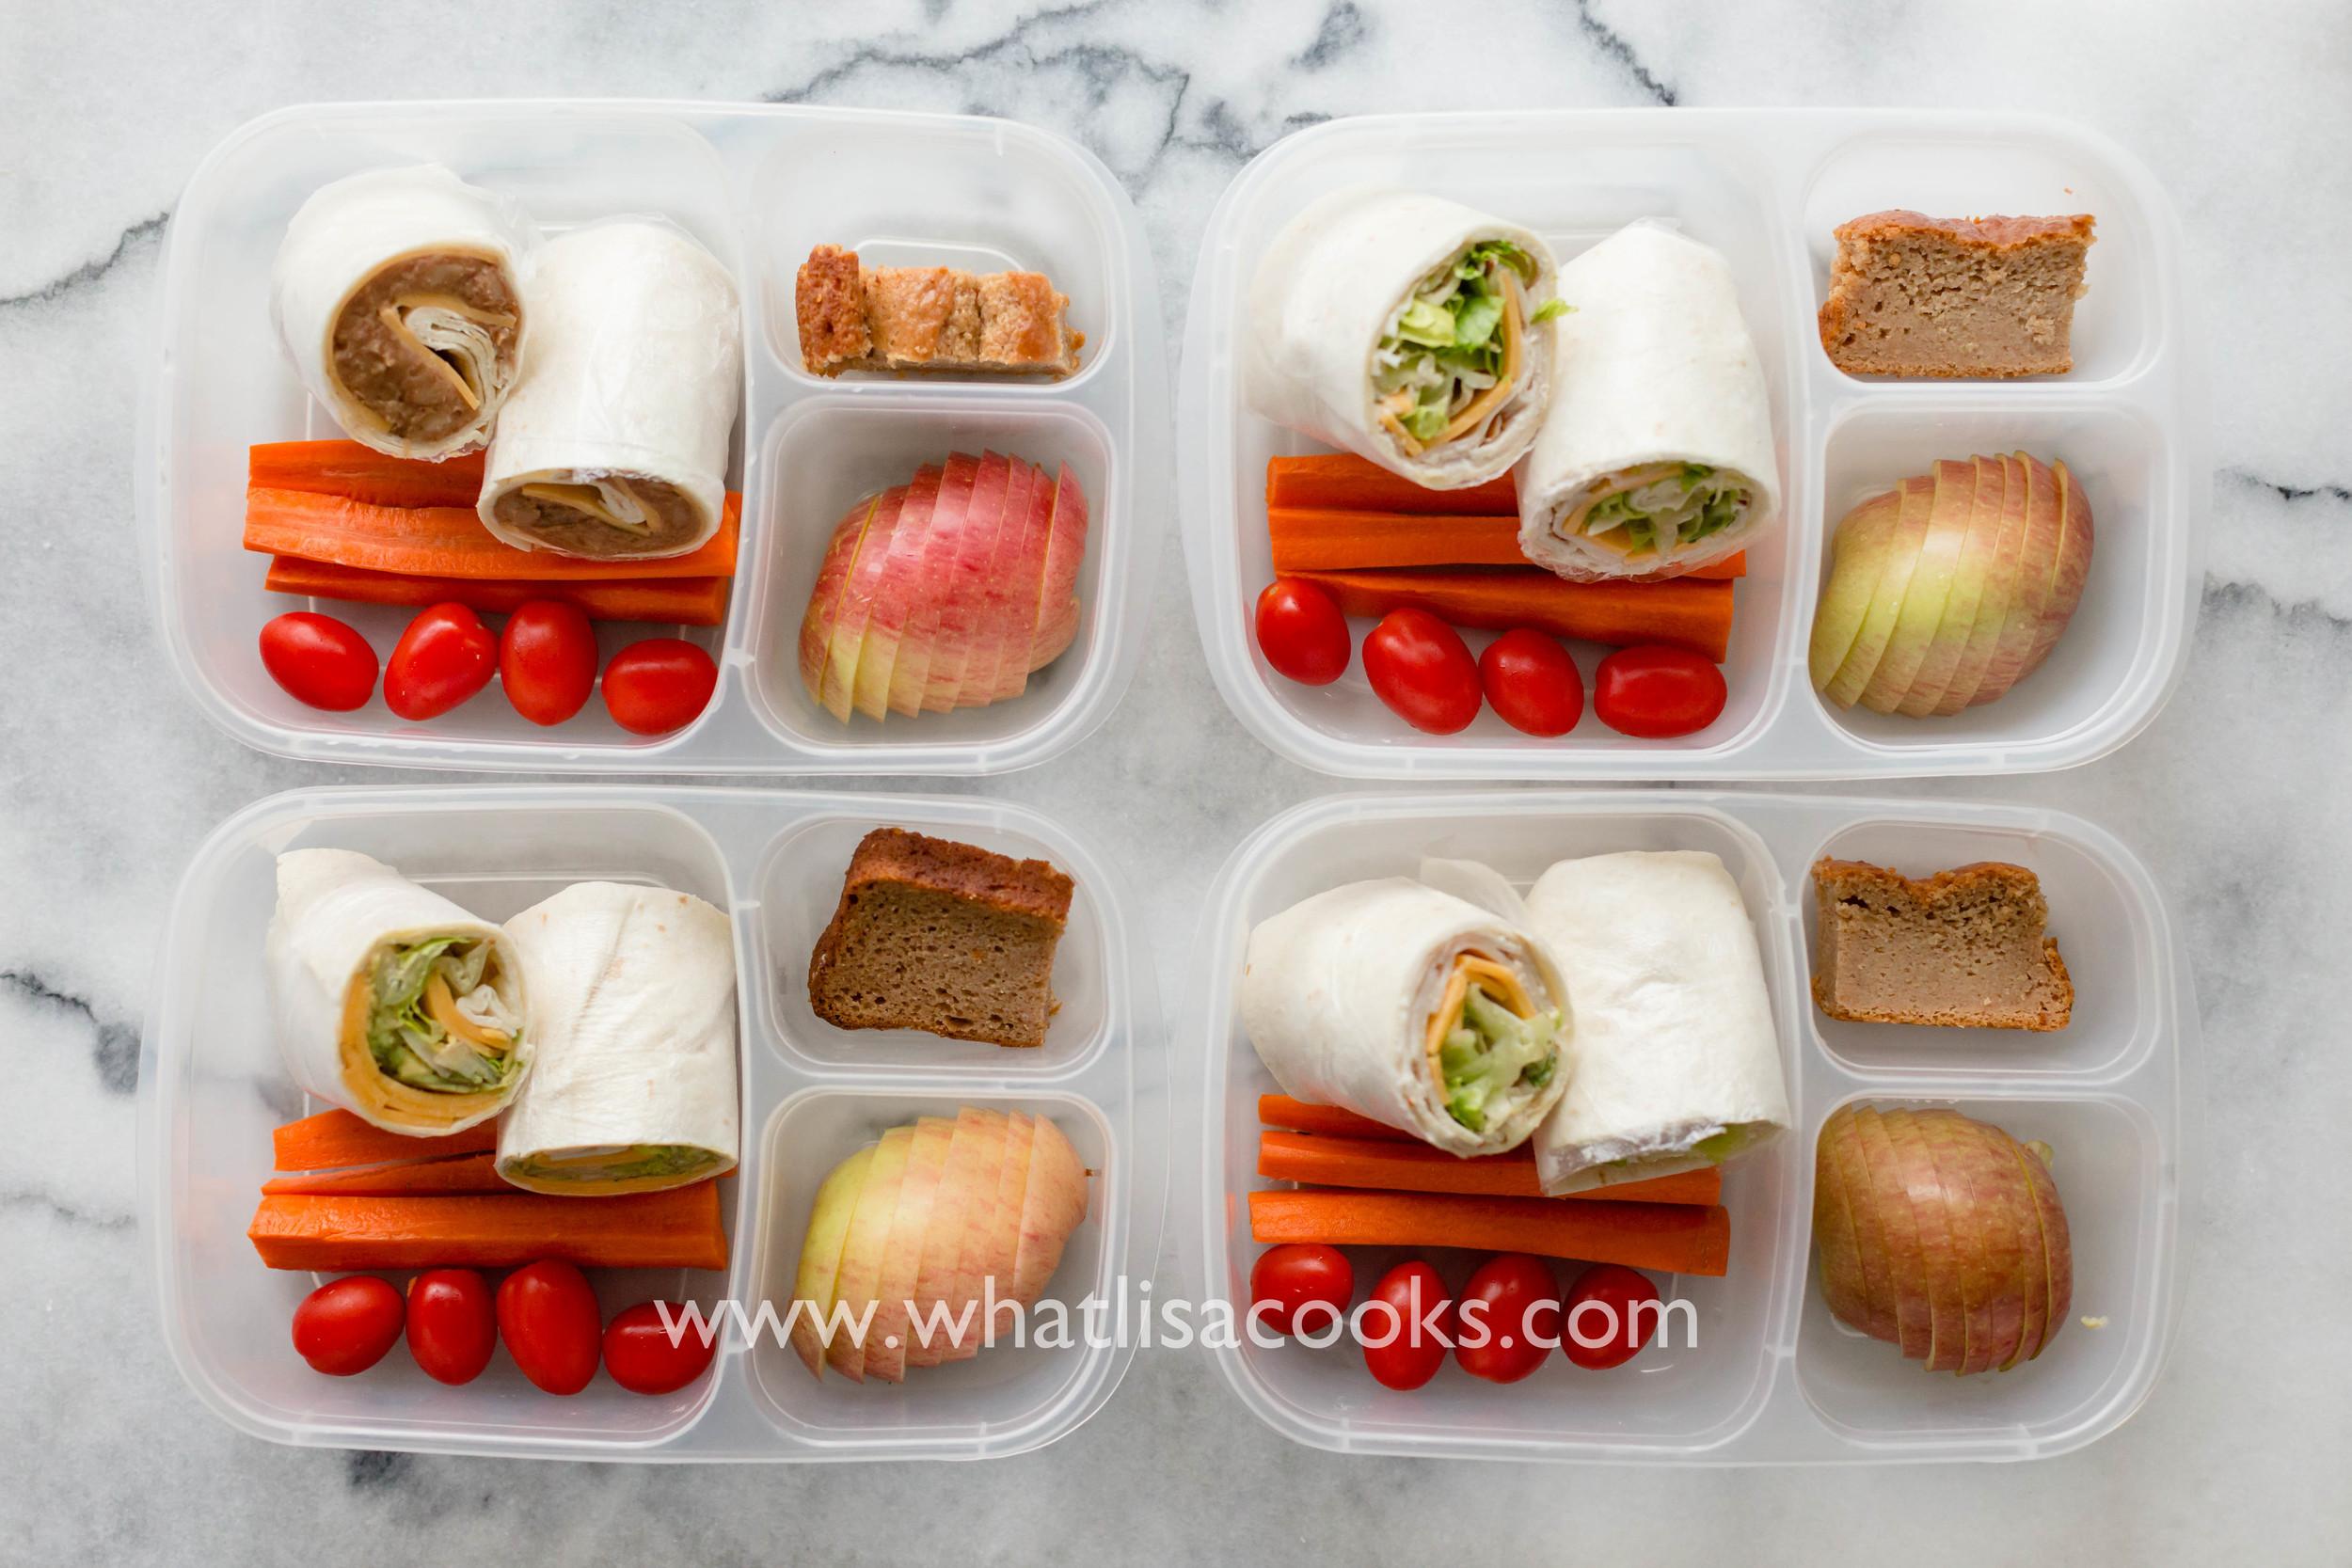 school lunch - tortilla wraps | whatlisacooks.com